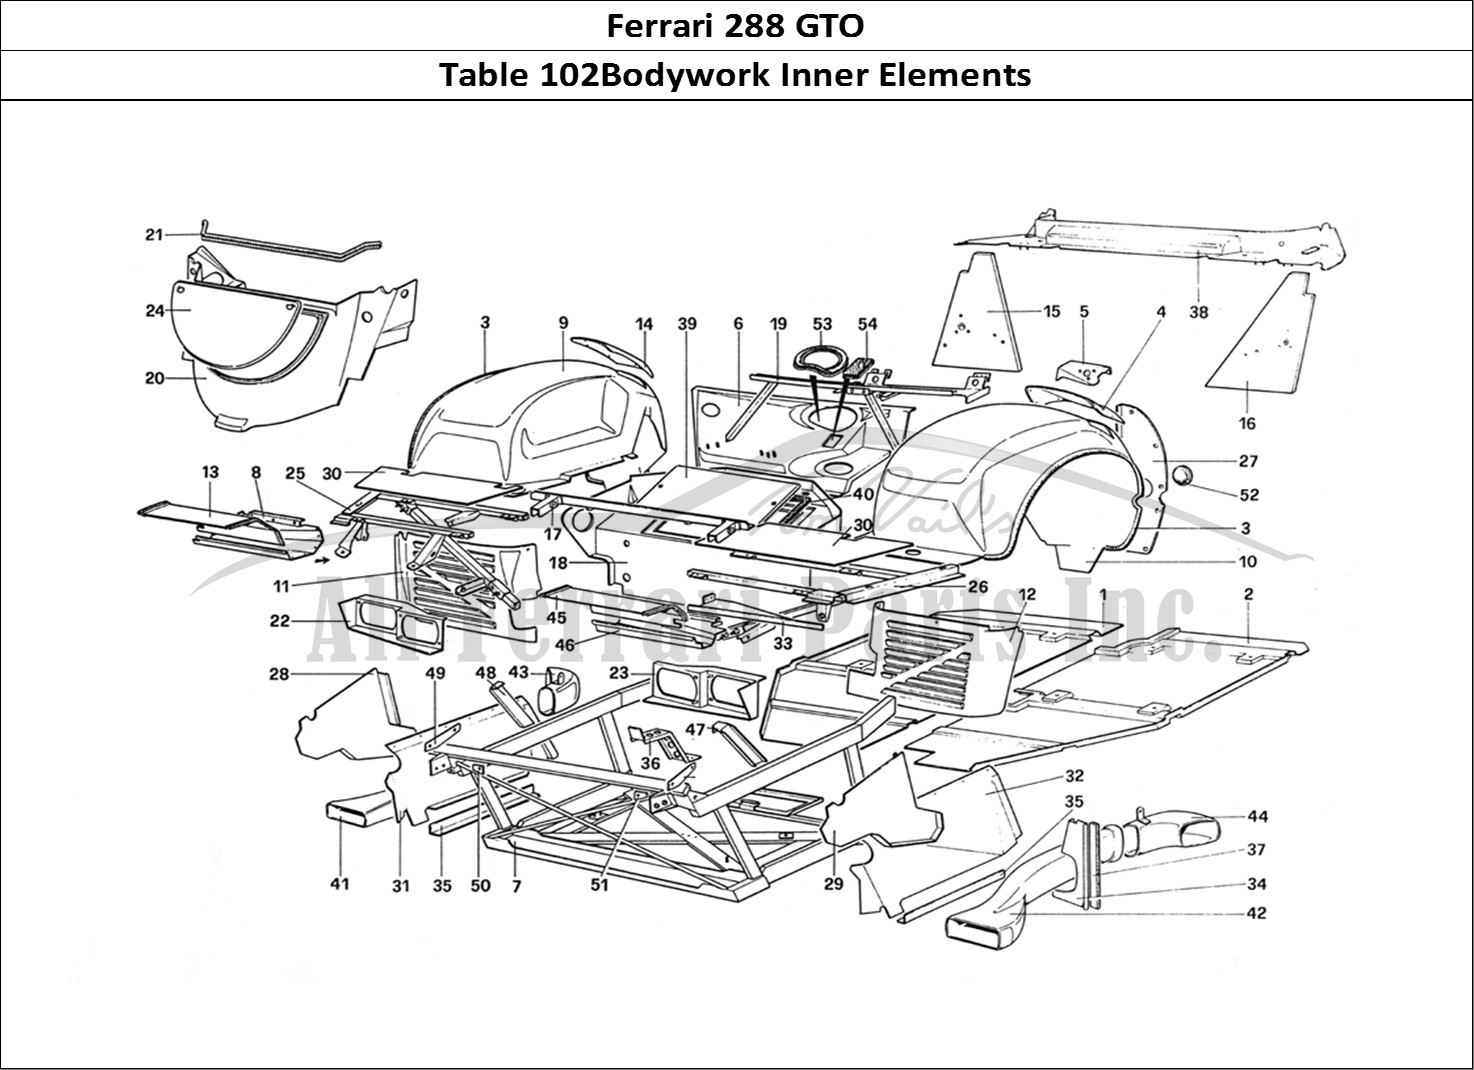 Buy original Ferrari 288 GTO 102Bodywork Inner Elements